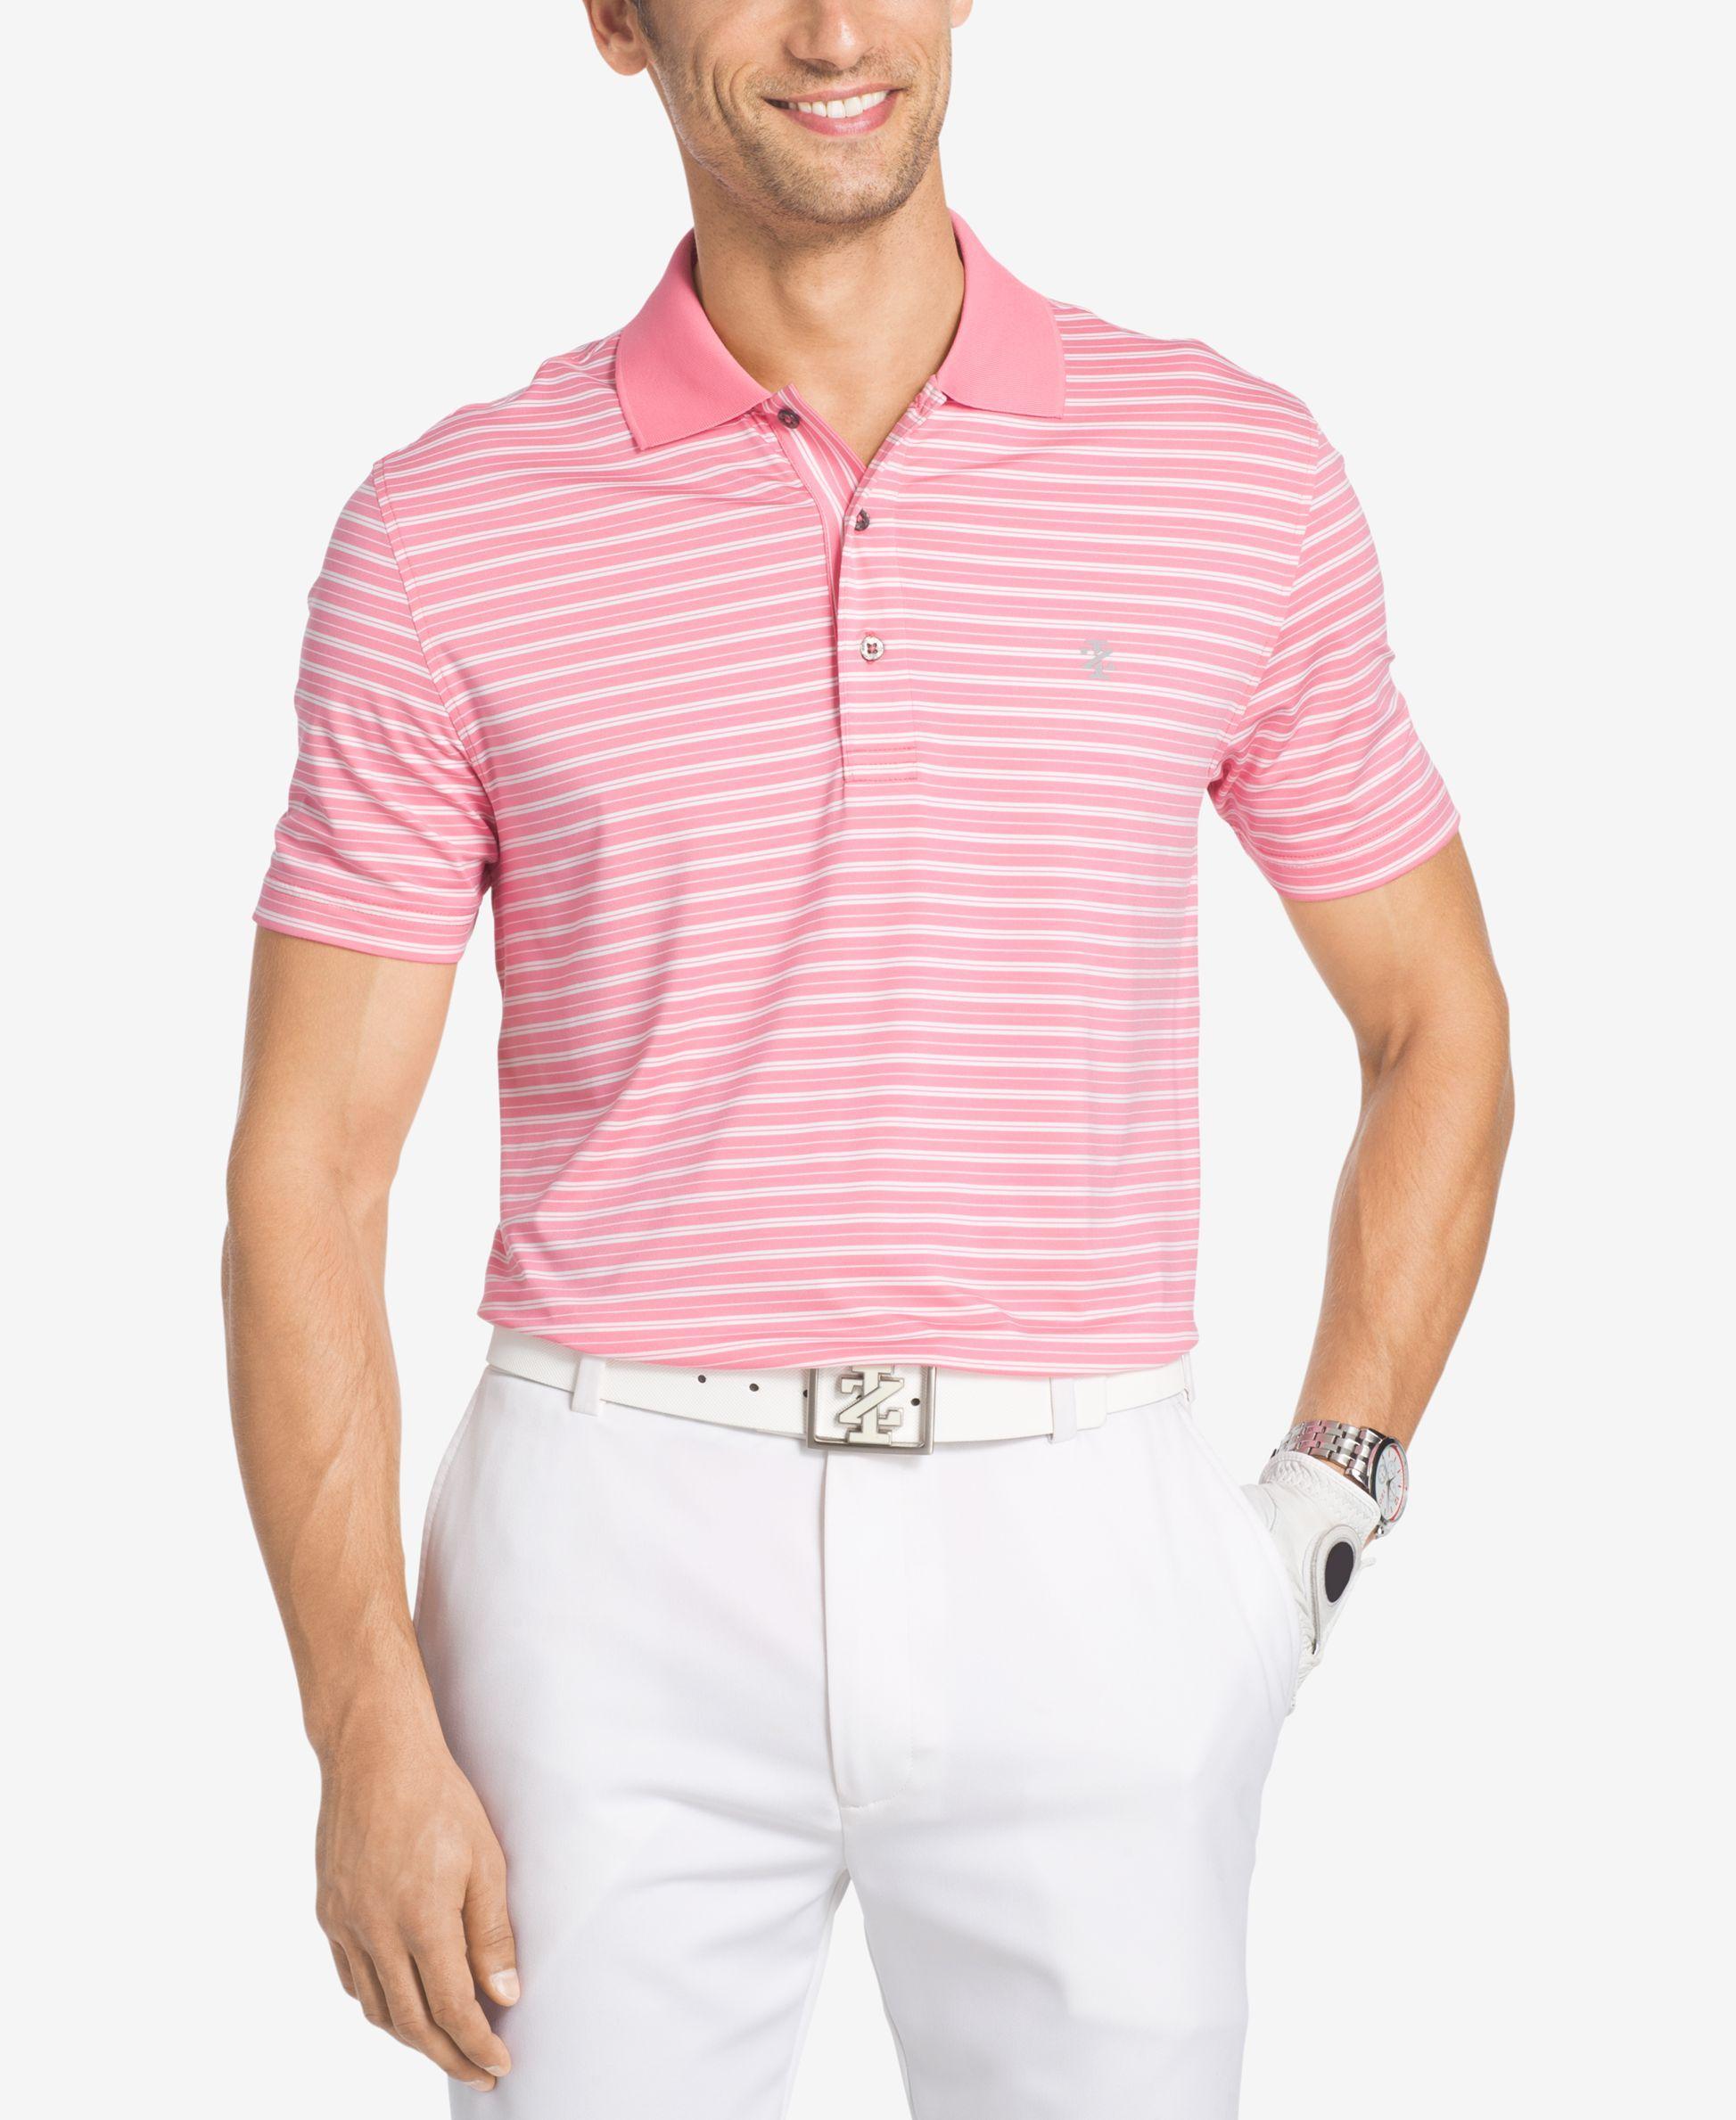 Izod Men's Fairway Striped Polo